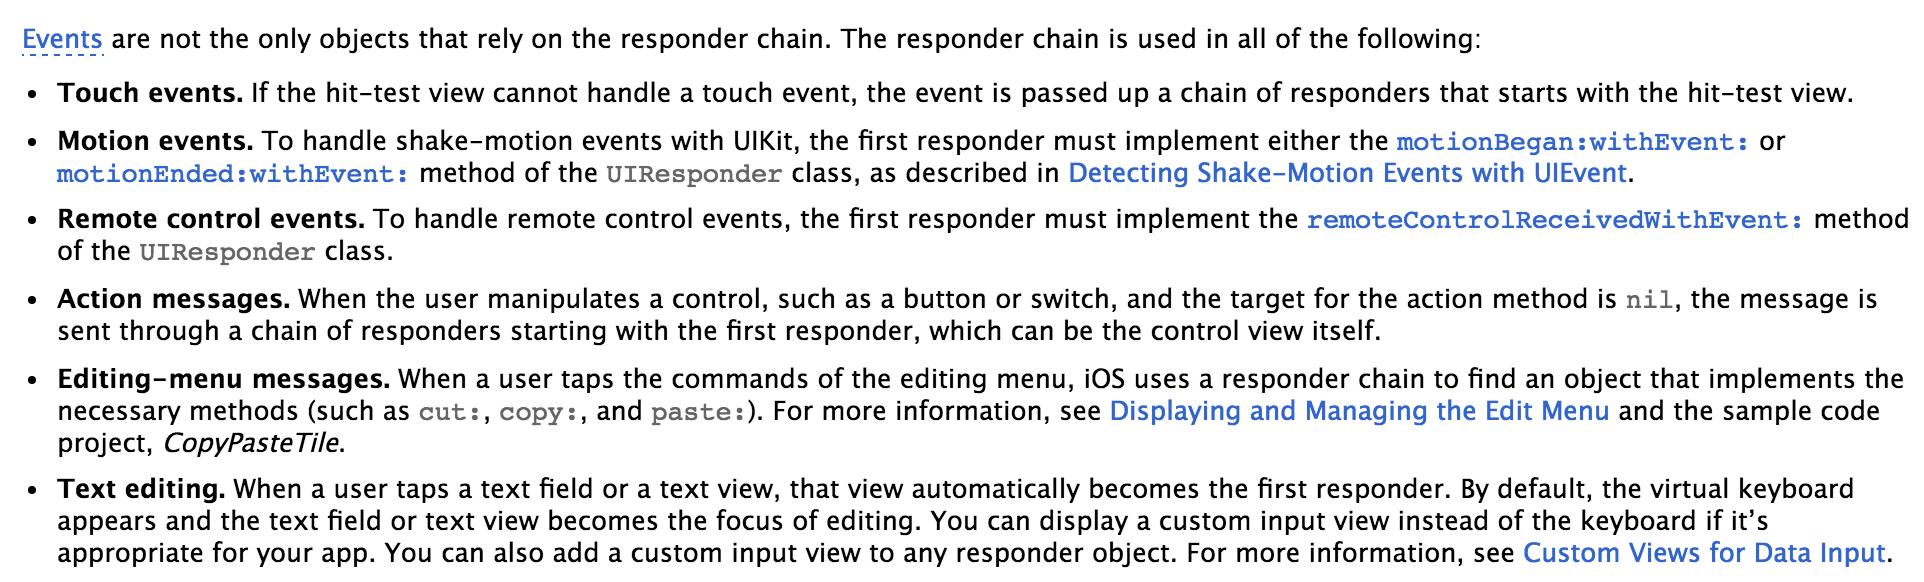 responder chain